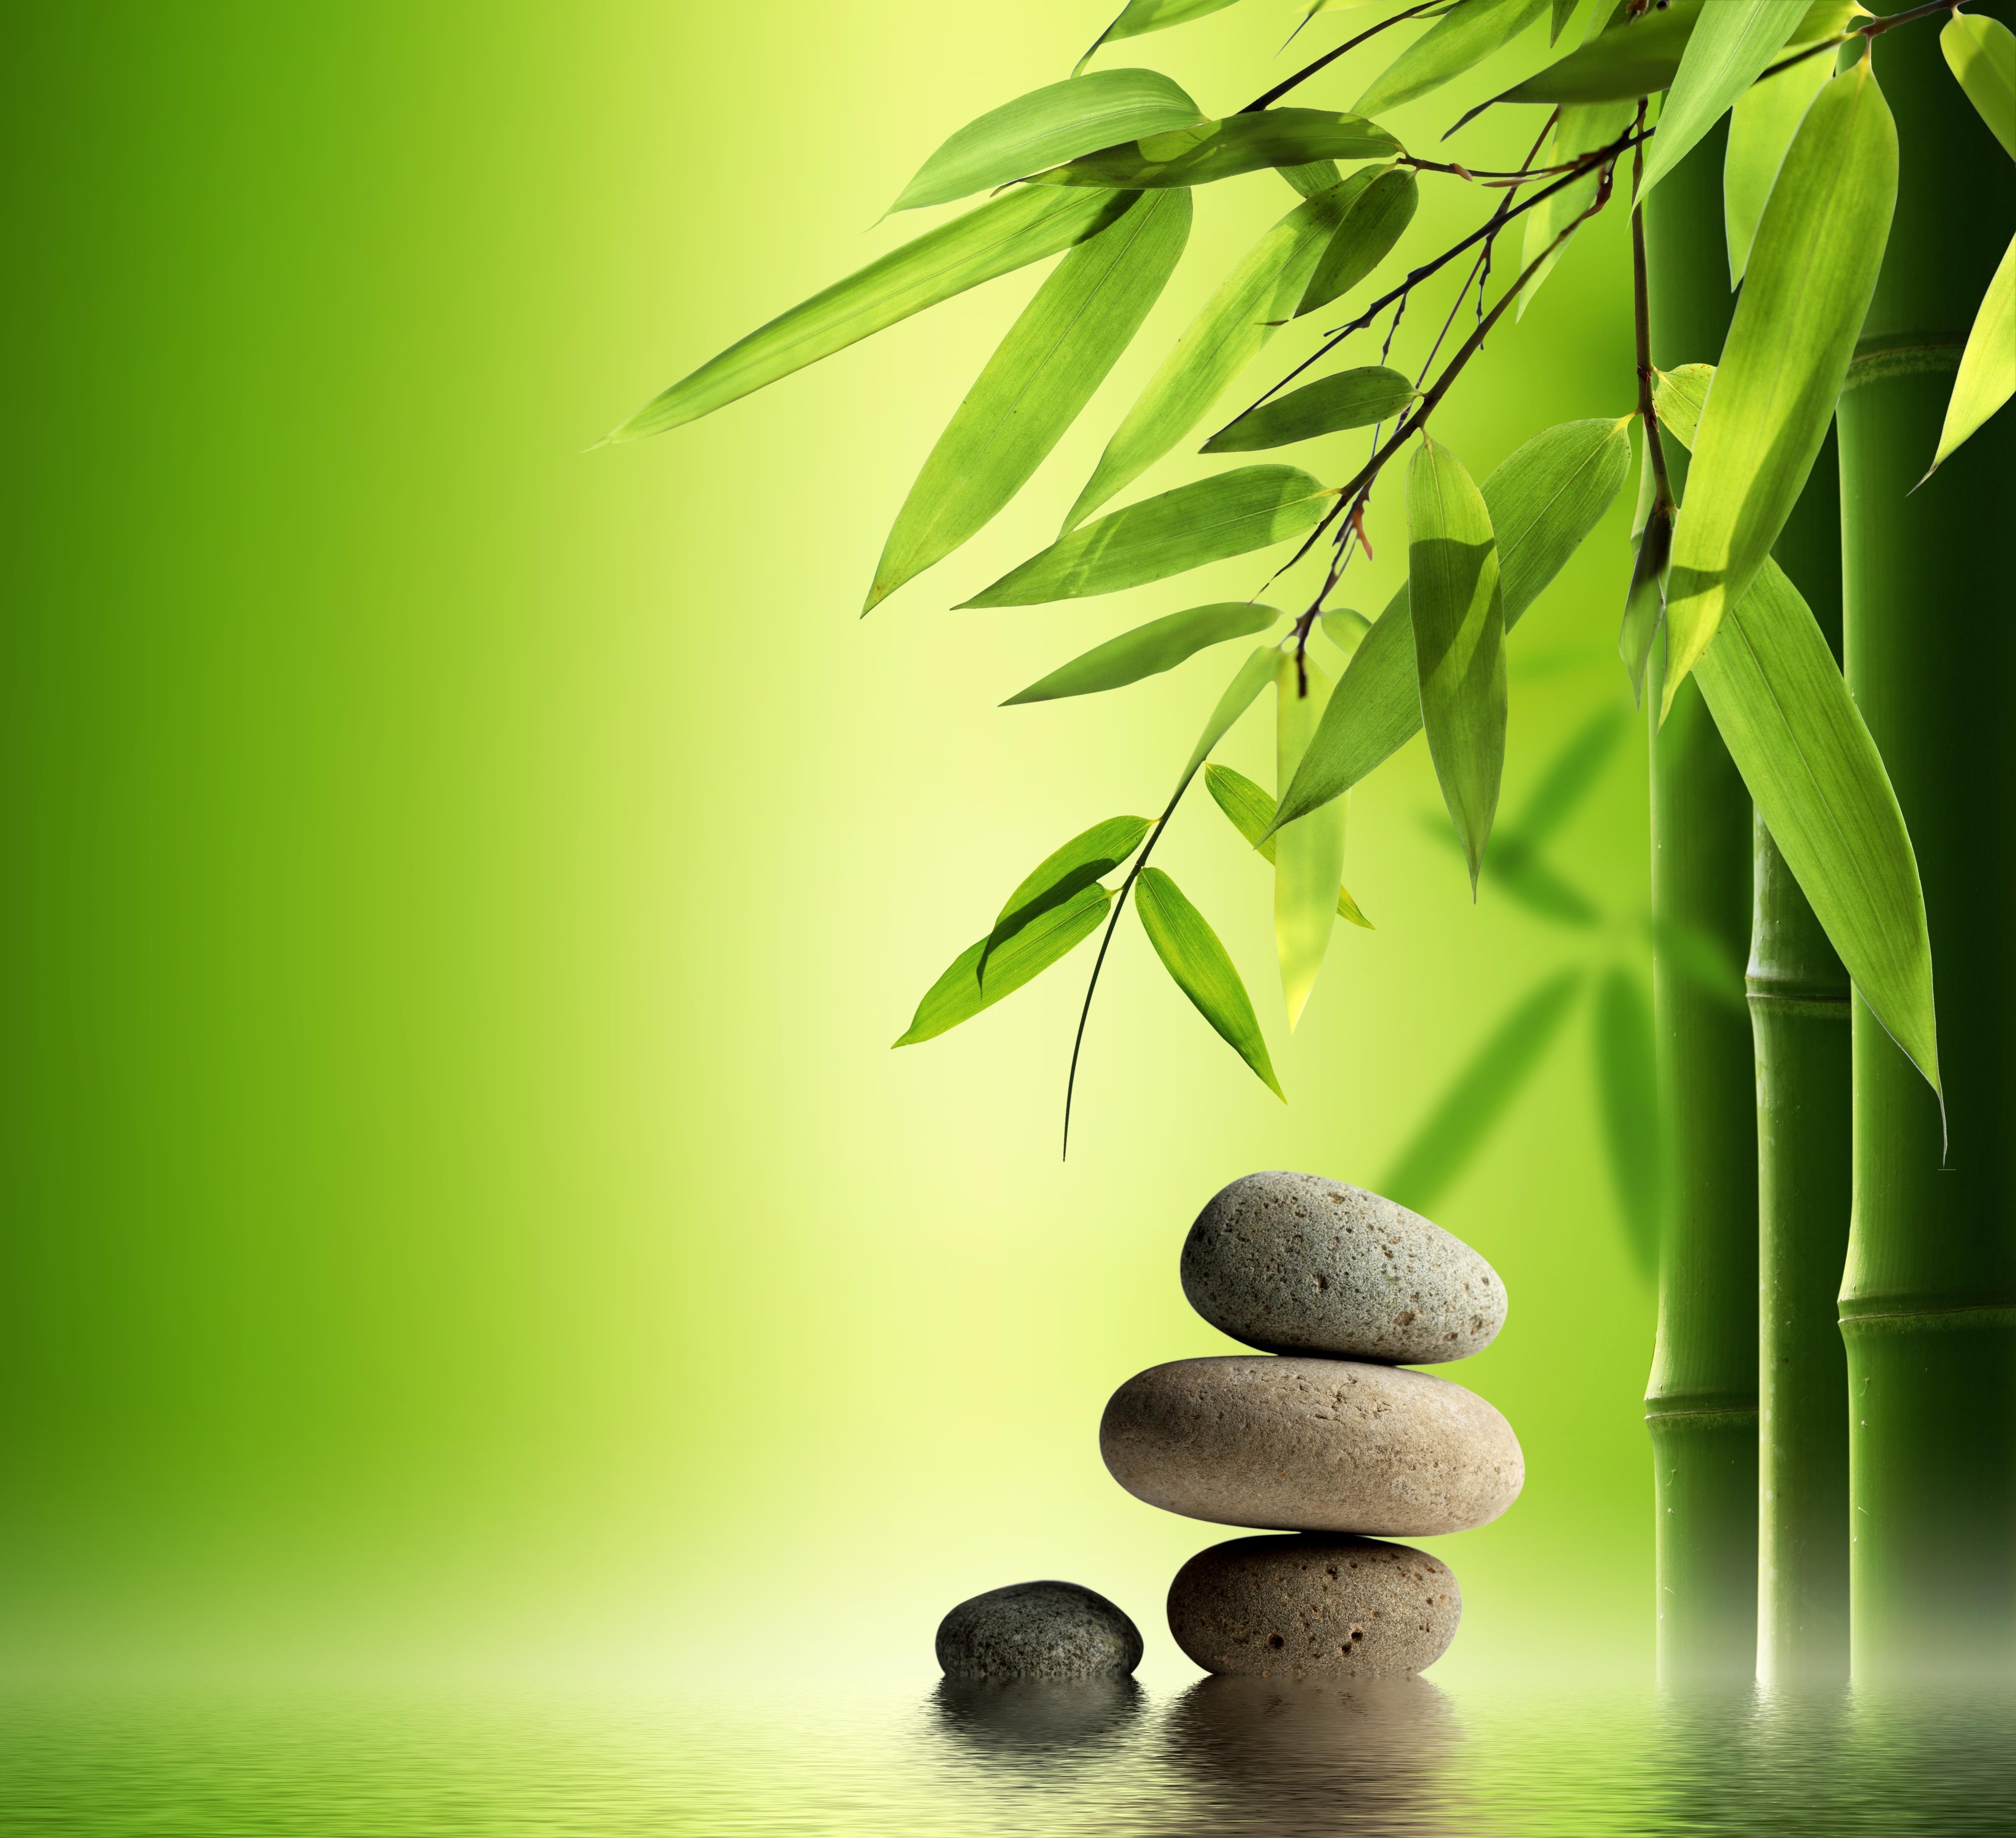 nature s gift of natural resource abundance